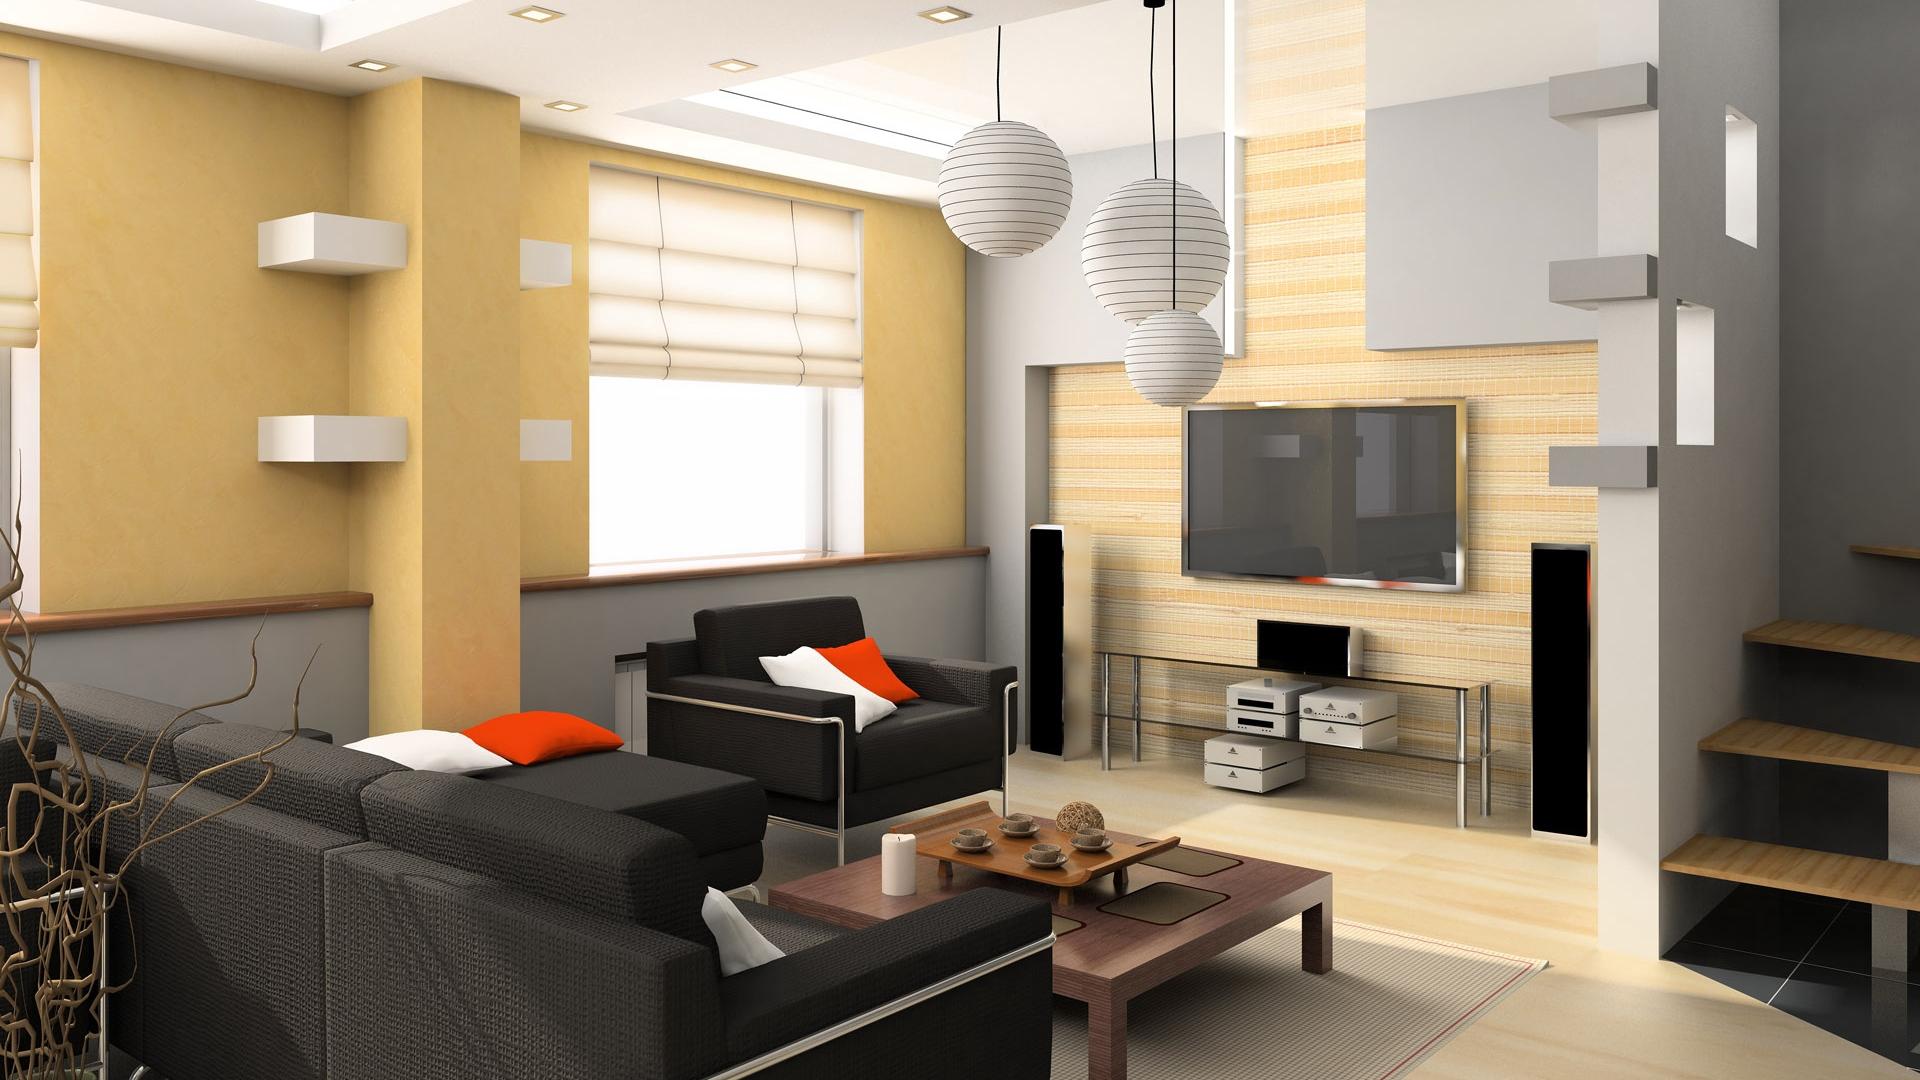 Wallpaper Room, Tv, Sofa, Interior, Design - Interior Design Ideas Living Room - HD Wallpaper